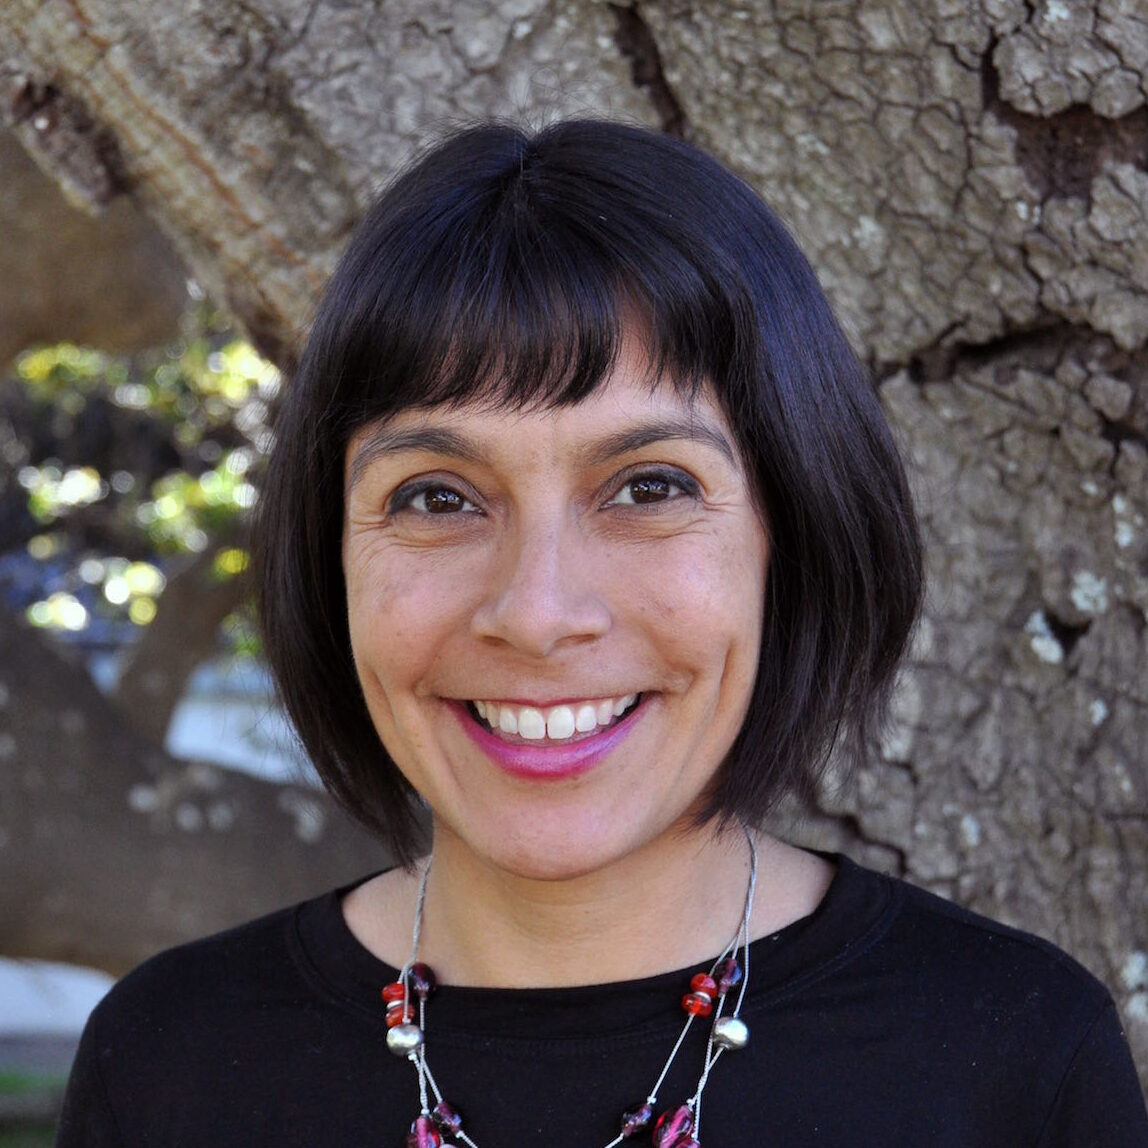 Veronica Terriquez